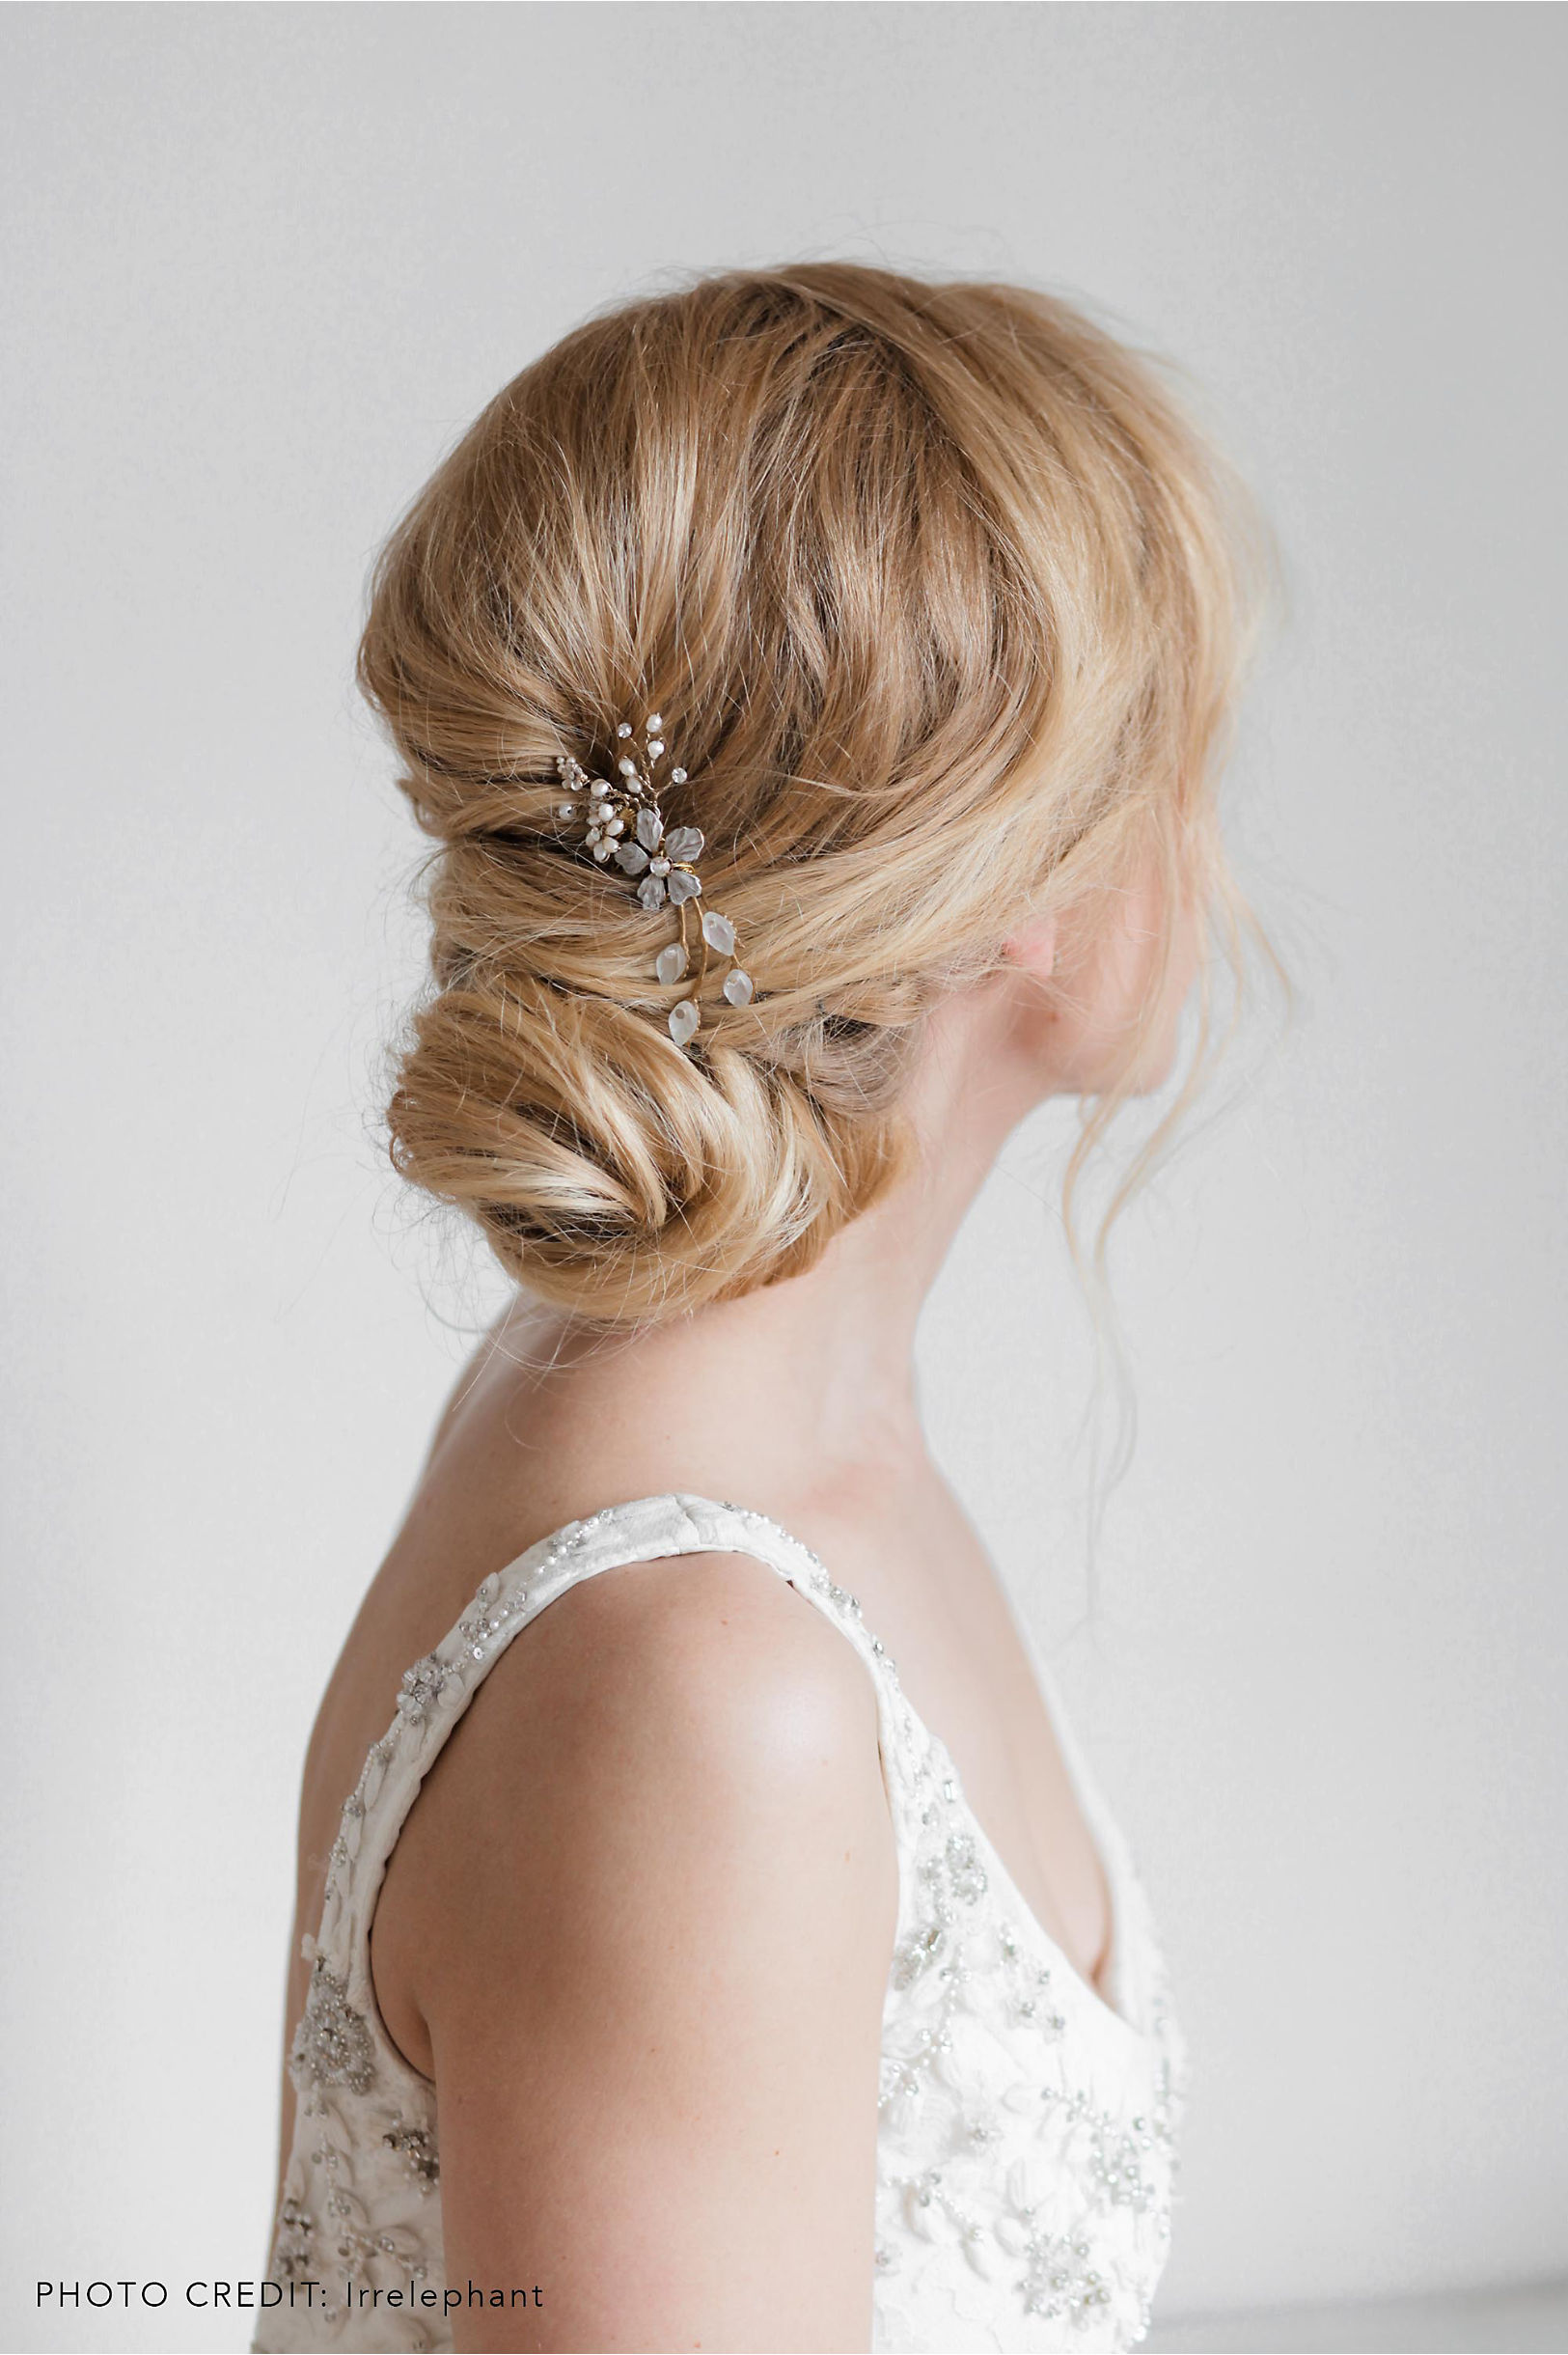 Winter Garden Hair Combs in Sale | BHLDN